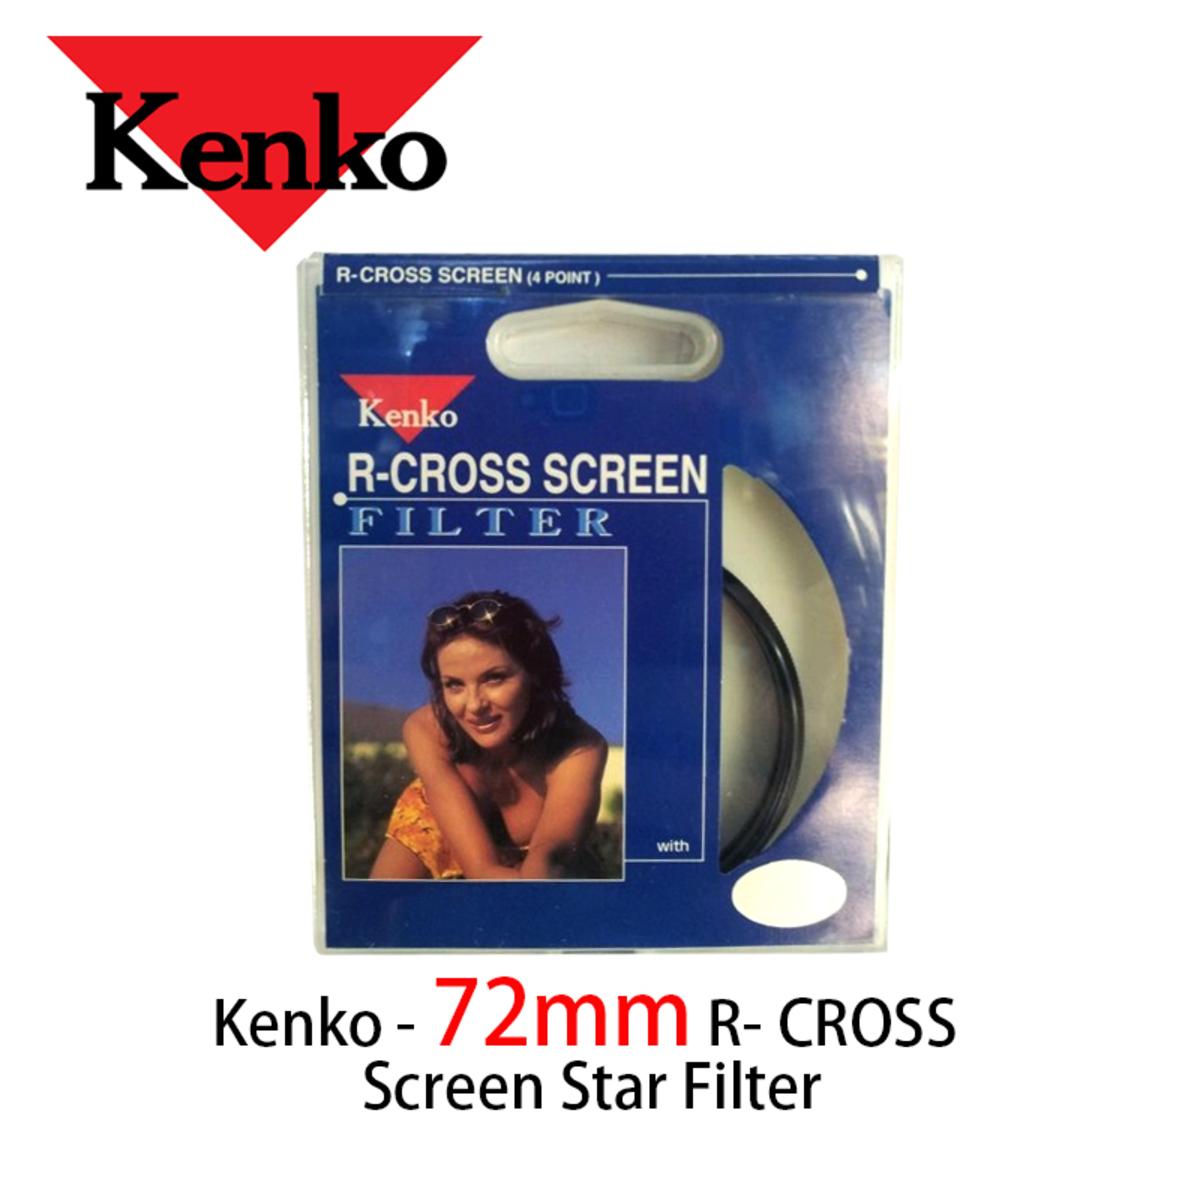 72mm R- CROSS Screen Star Filter 可調十字星光鏡